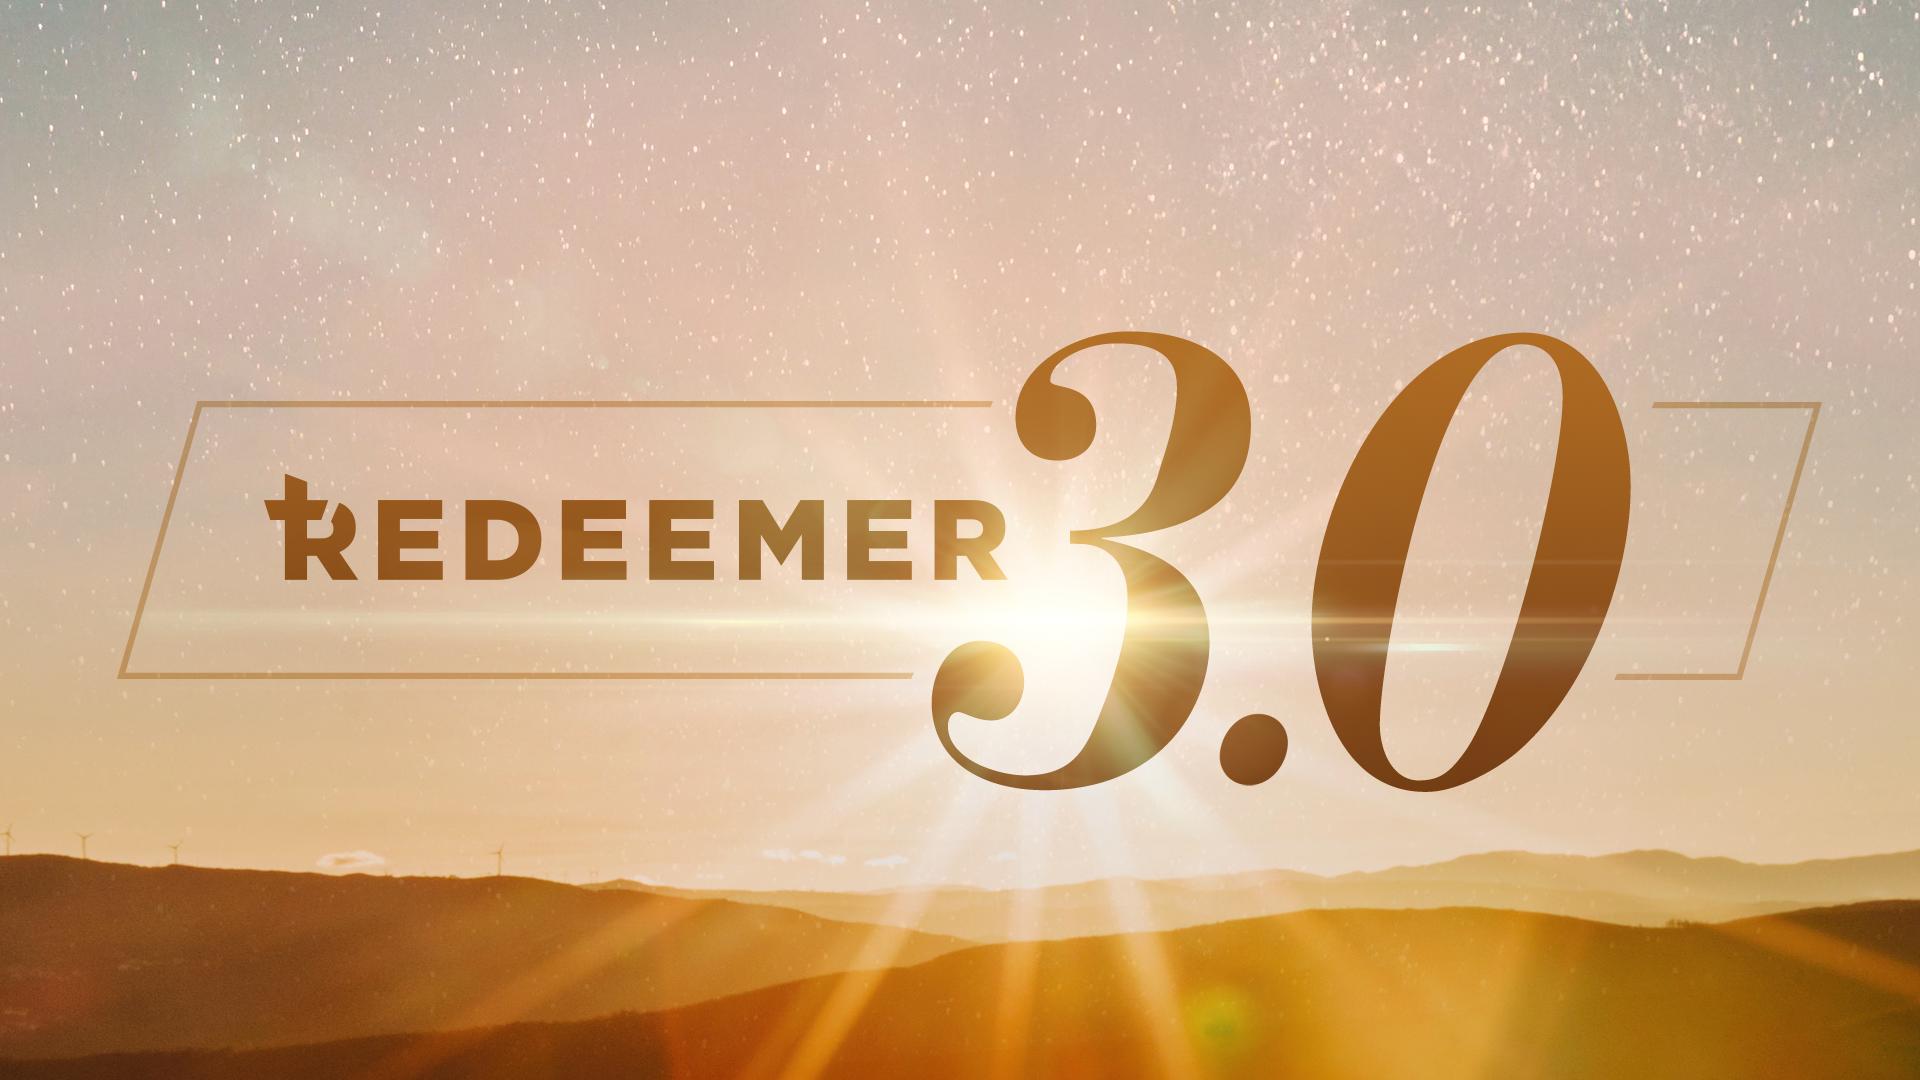 Redeemer_3.0_Slide.png